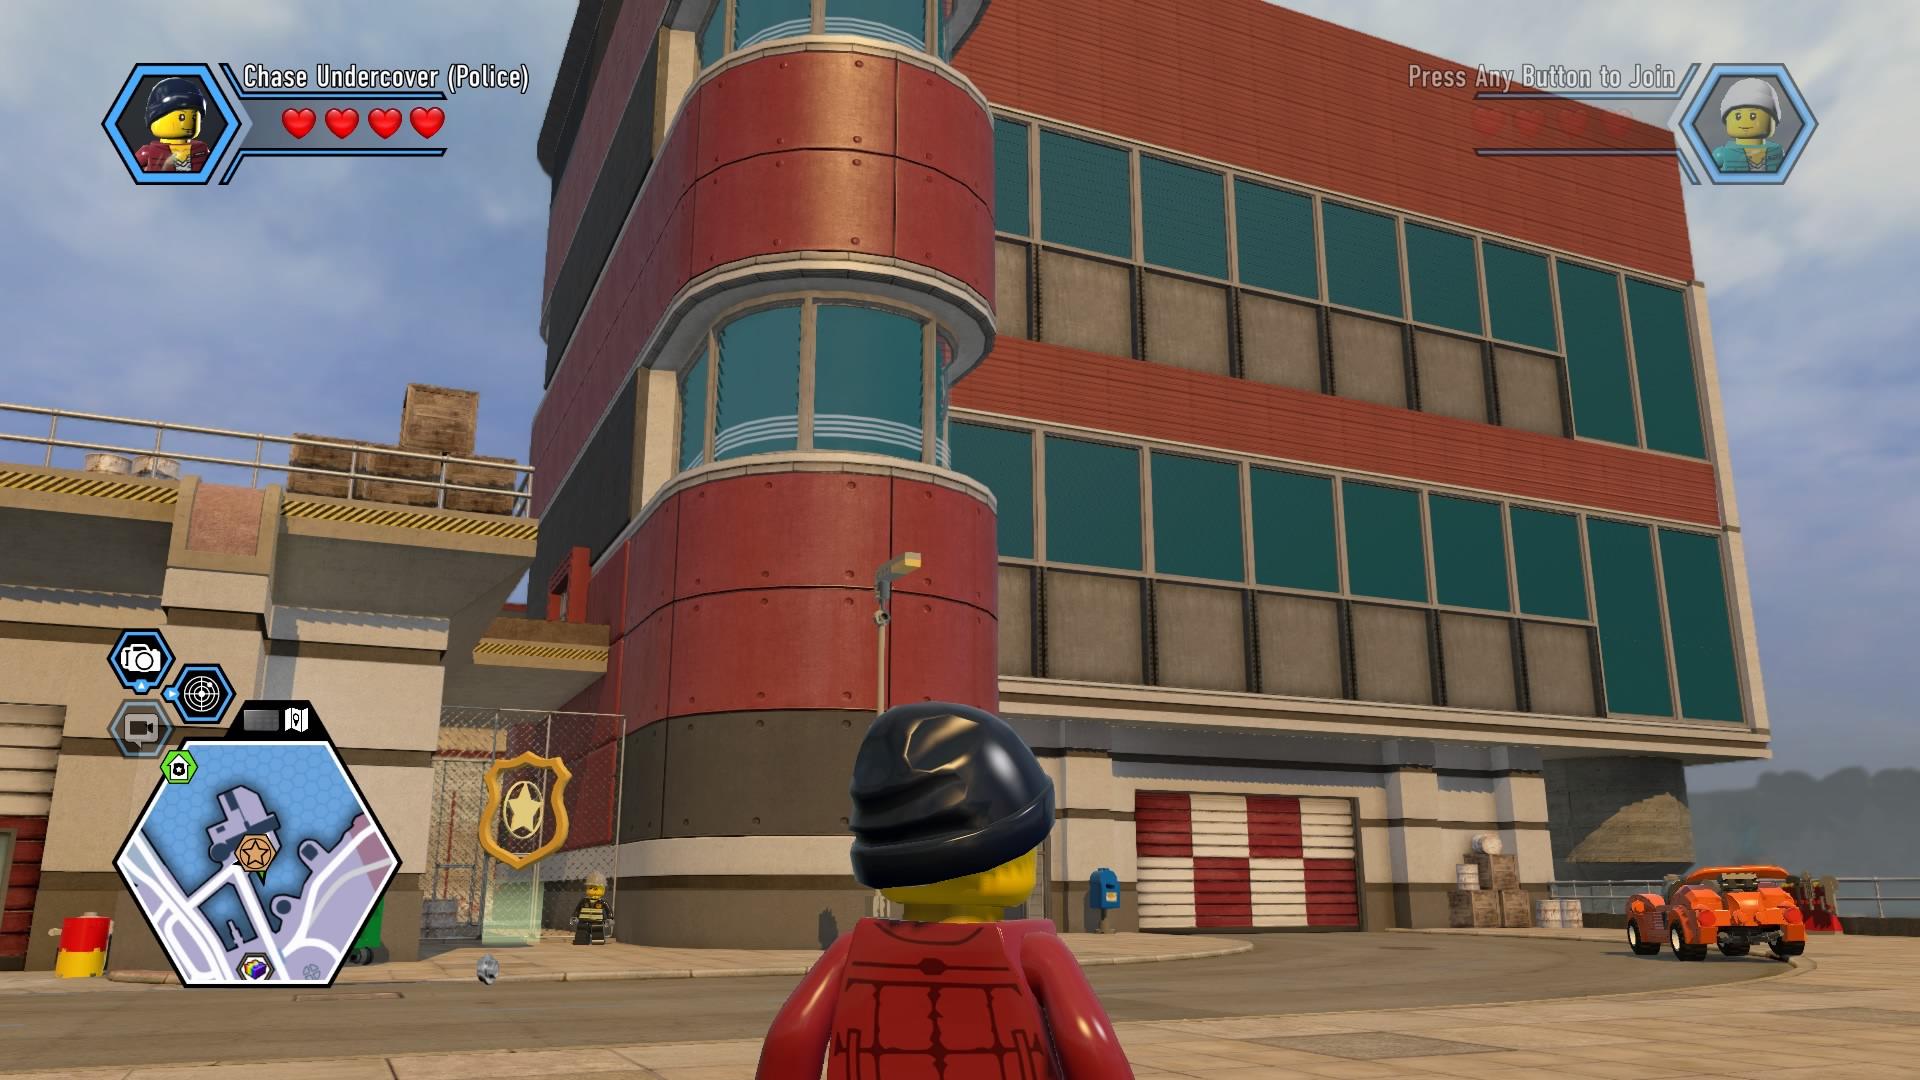 LEGO City Undercover Walkthrough Chapter 10 Fire Station Guide Walkthroughs The Escapist